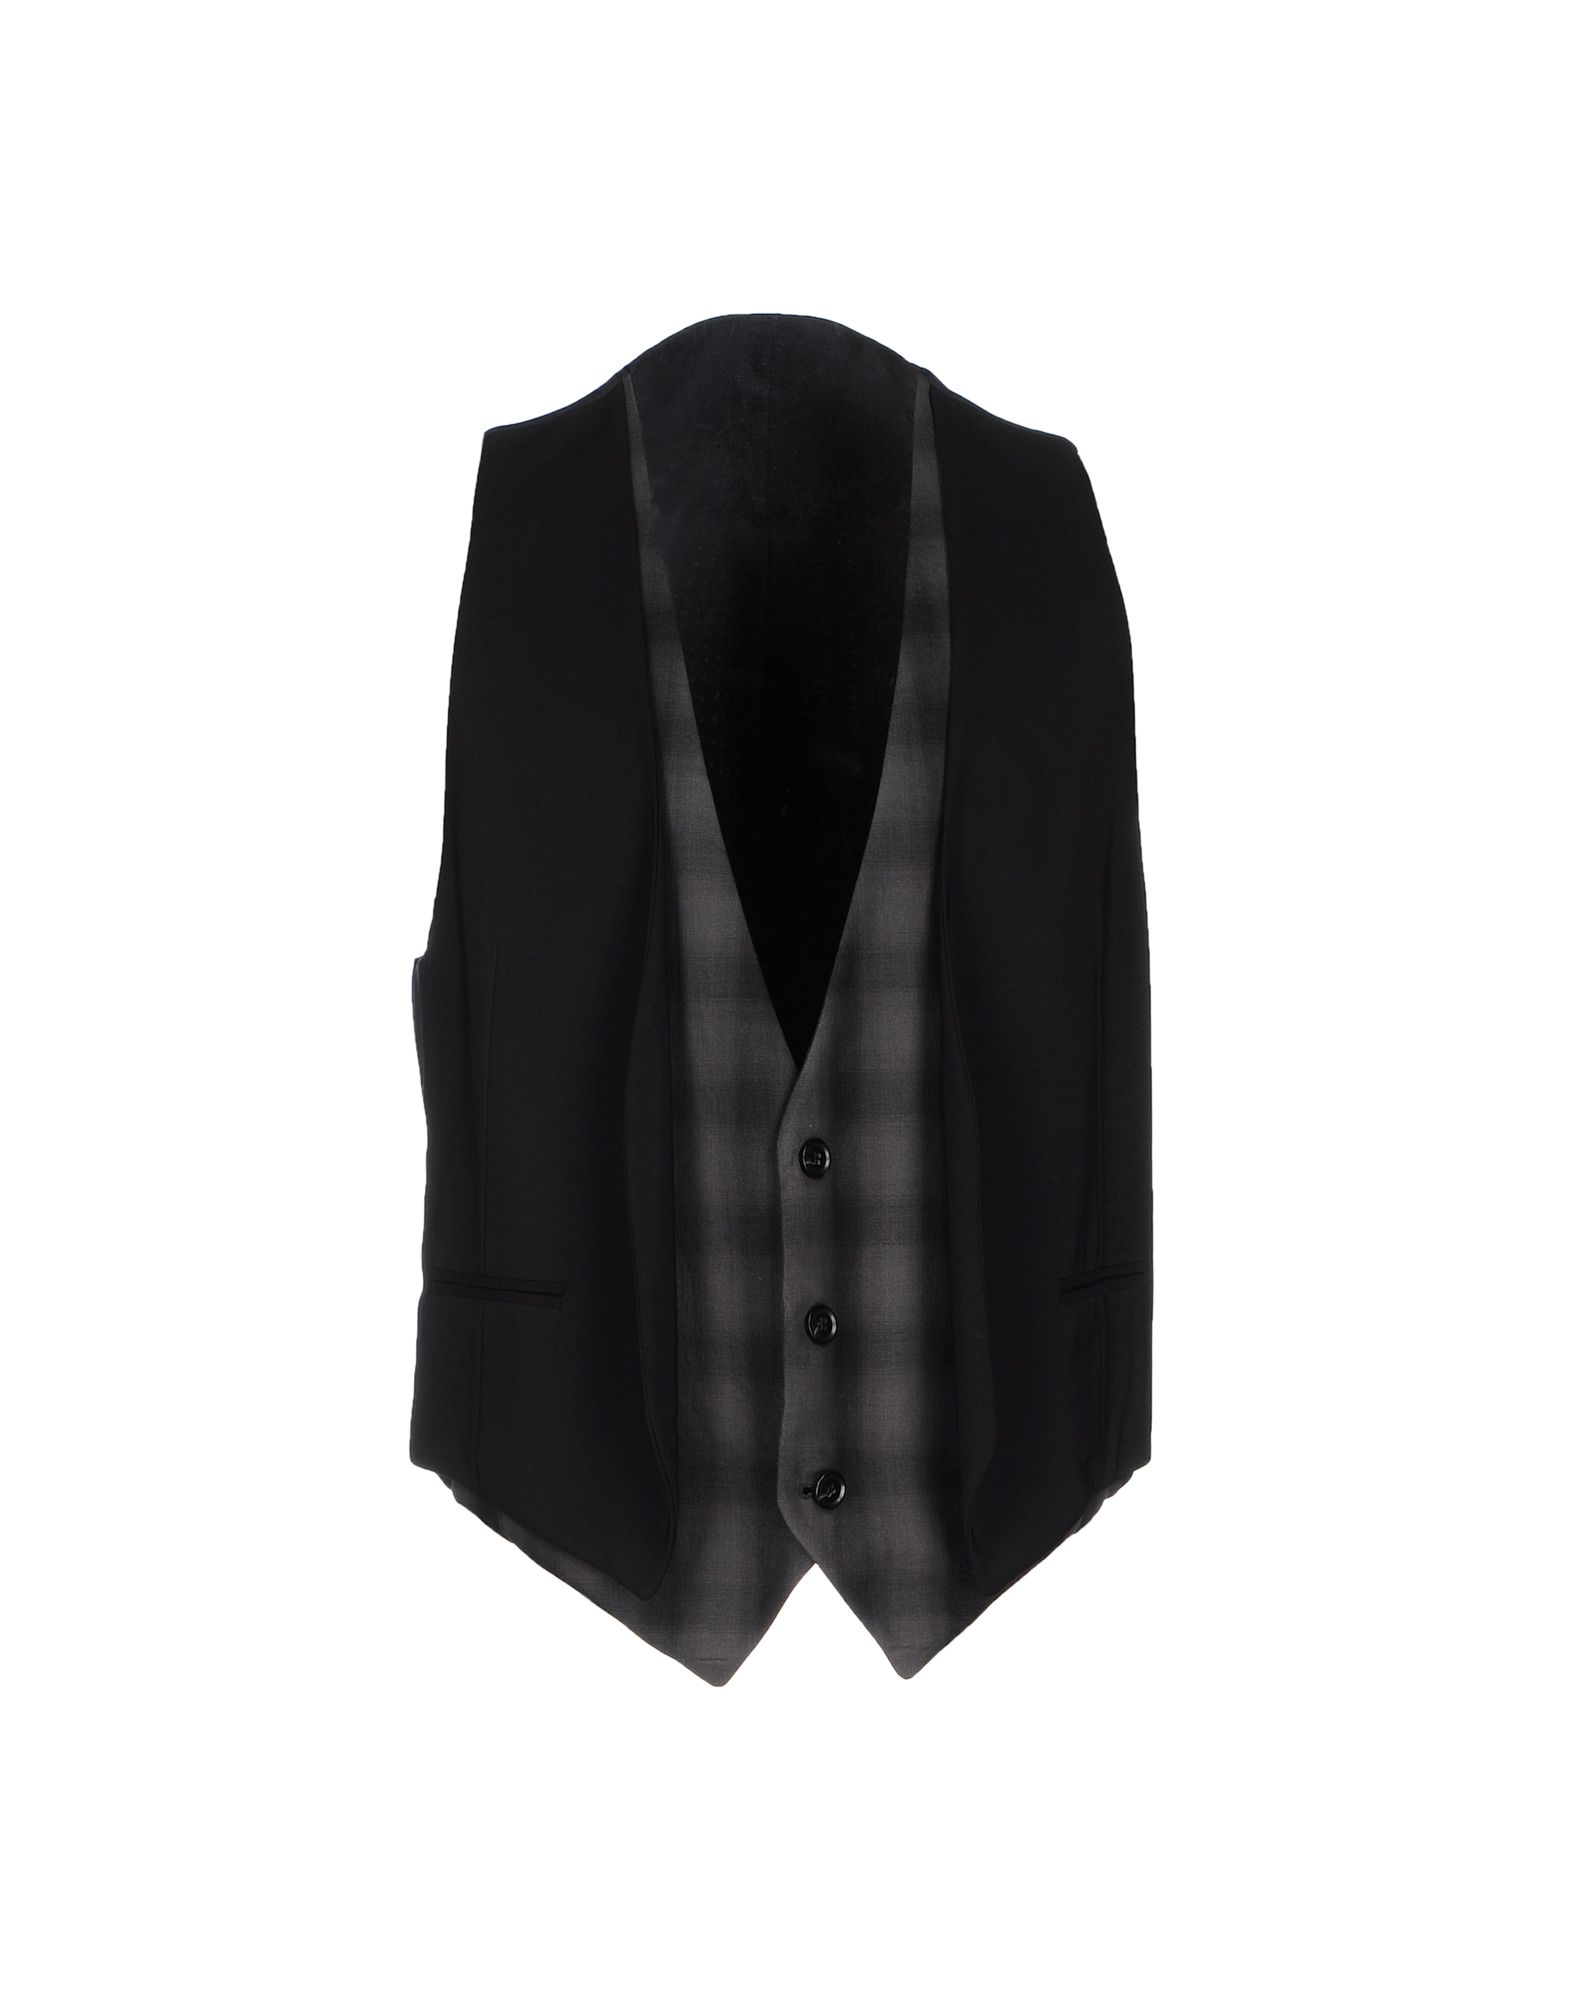 RING Suit Vest in Black